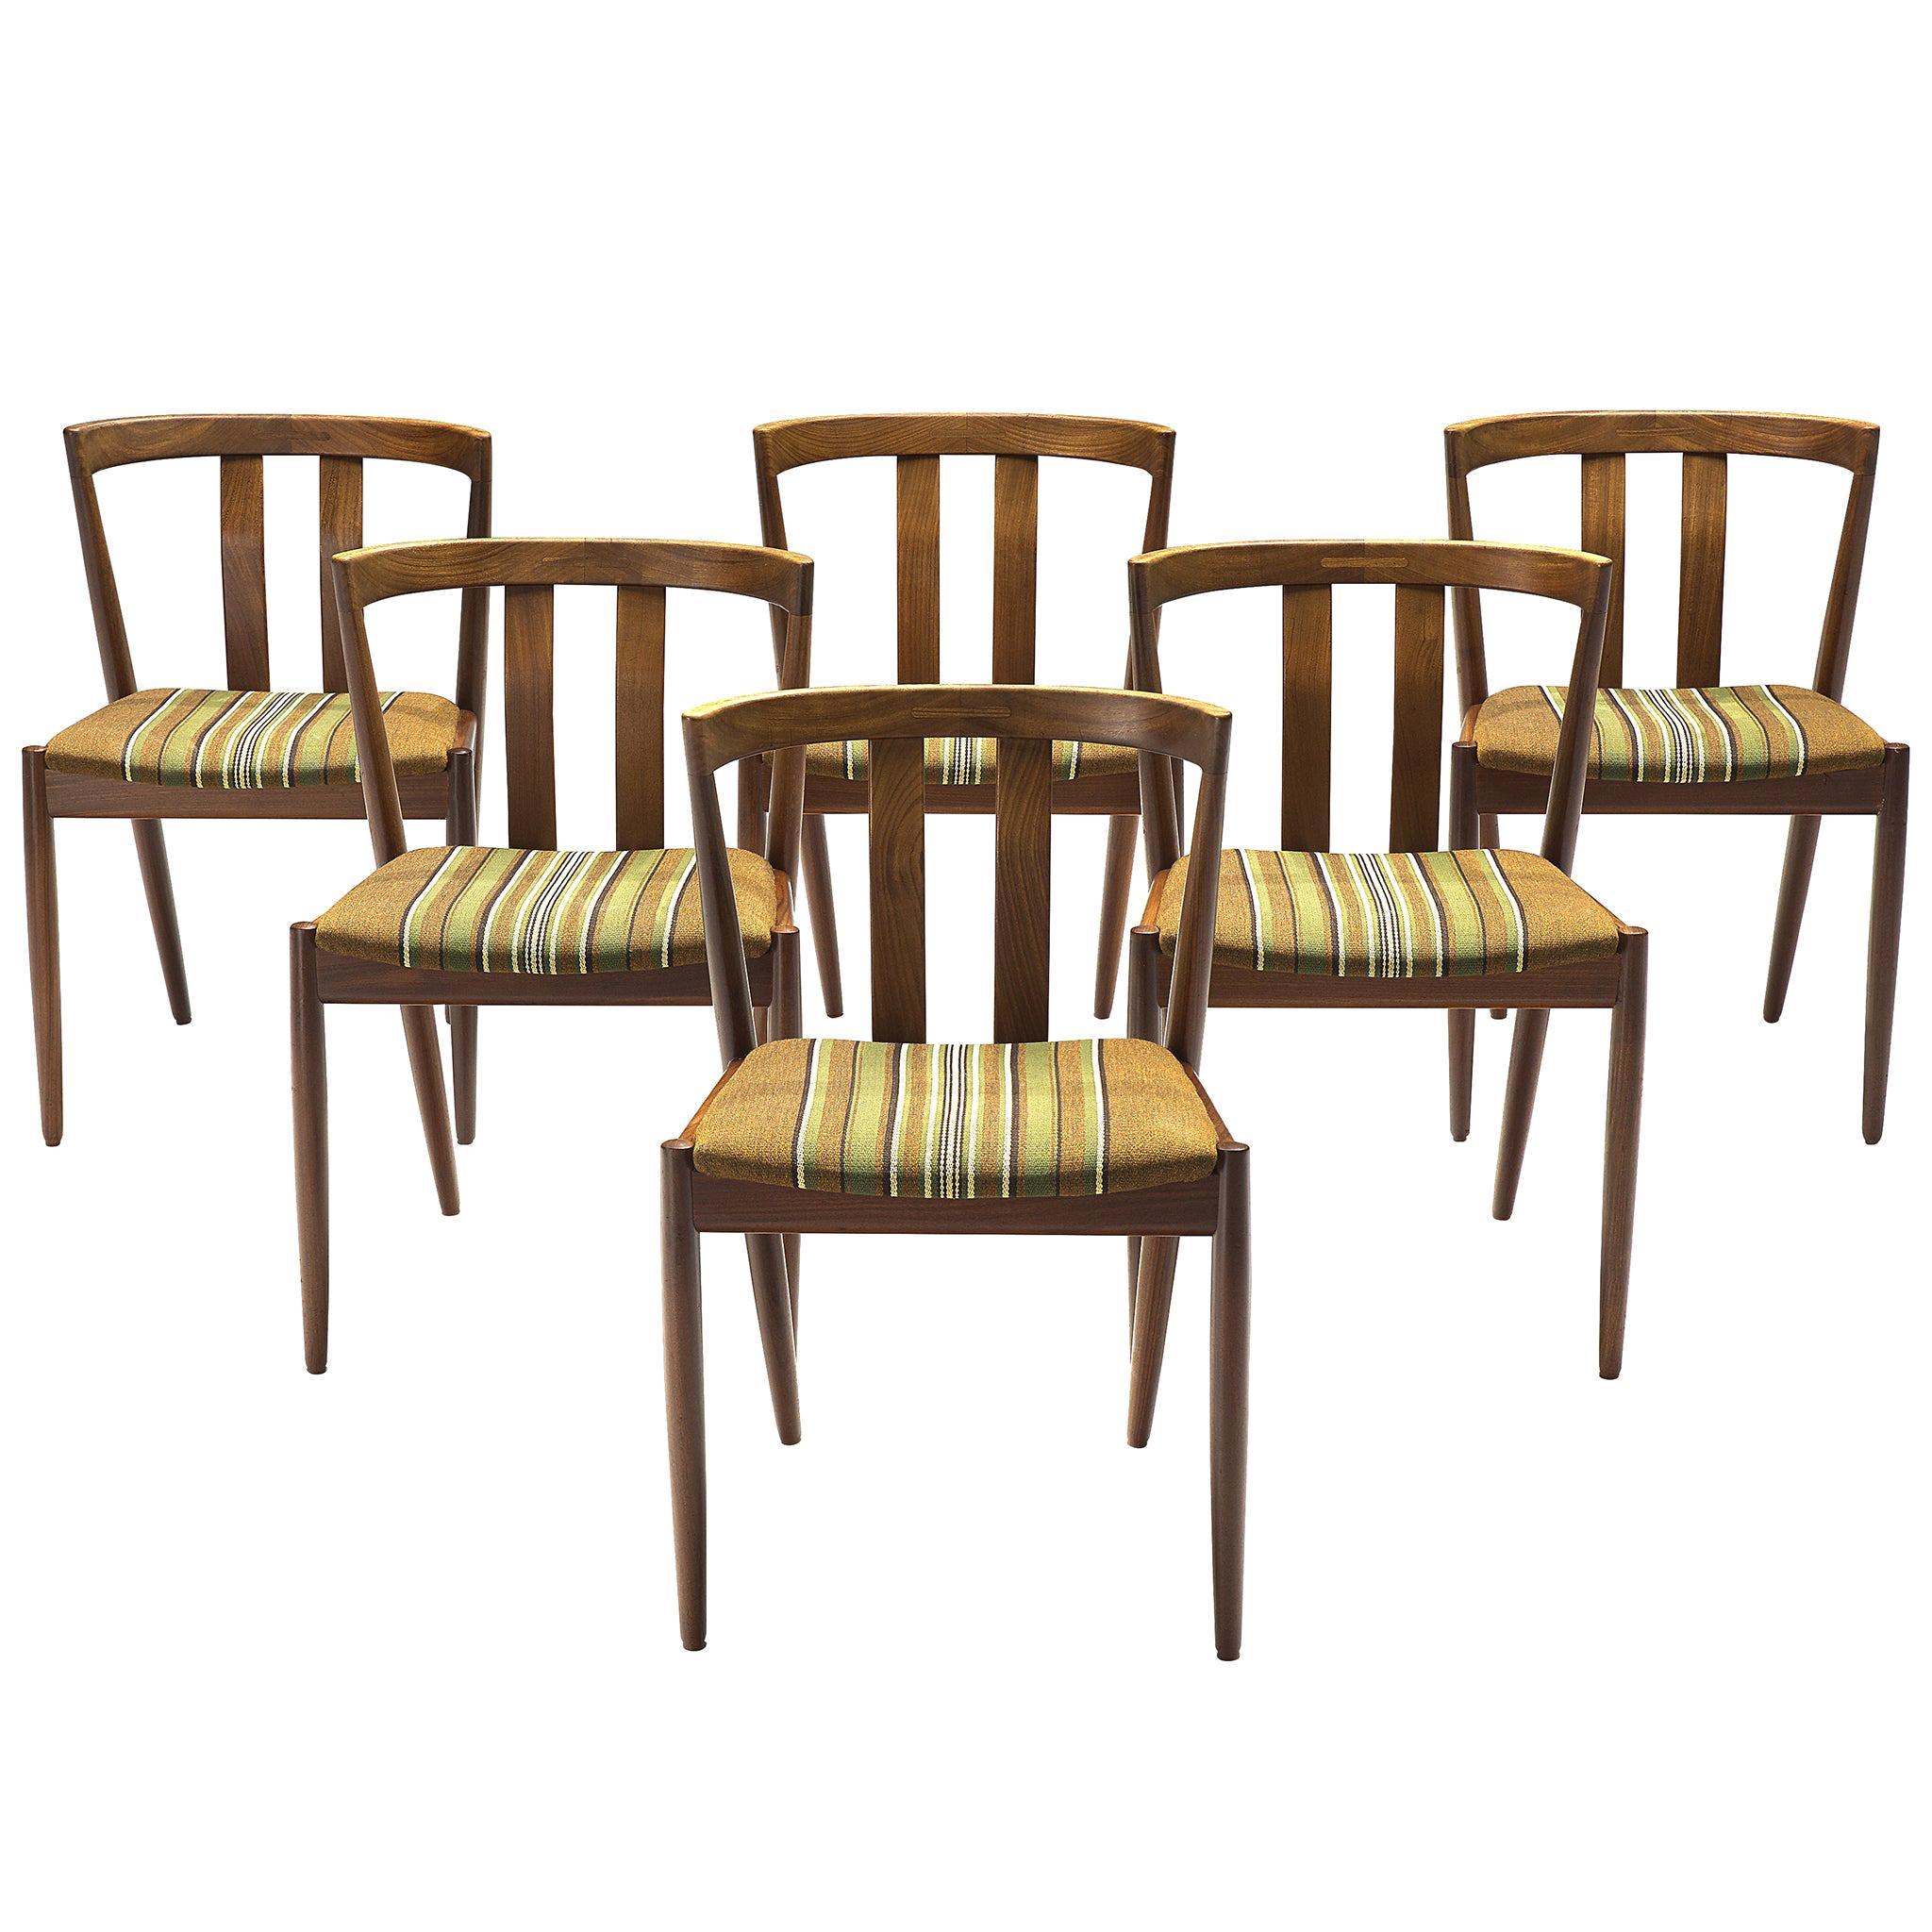 Danish Set of Six Teak Dining Chairs, 1960s